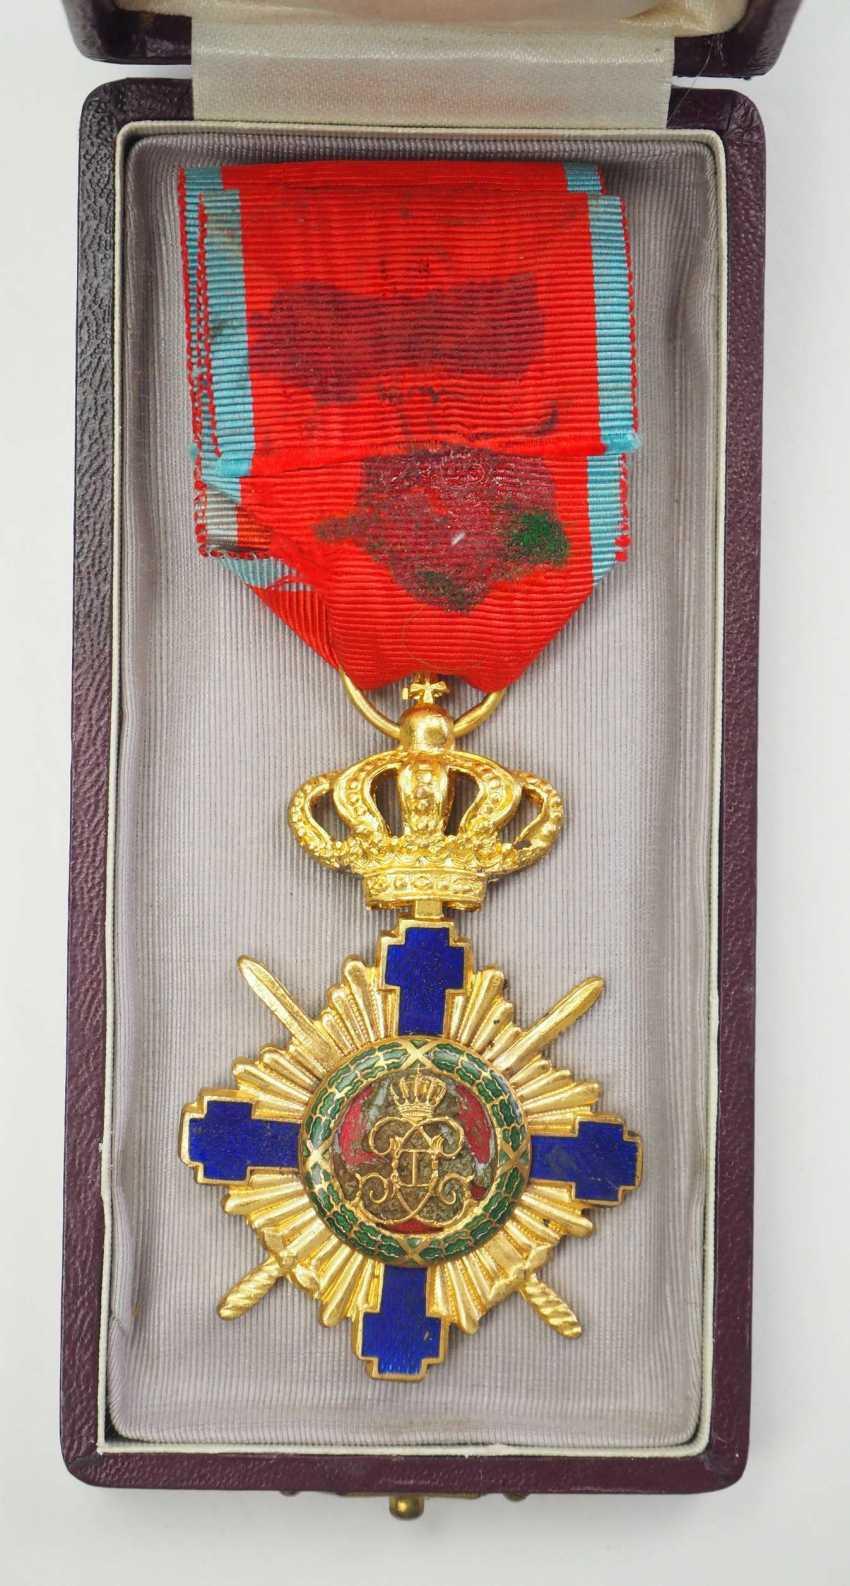 Romania: Order of the Star of Romania - photo 4